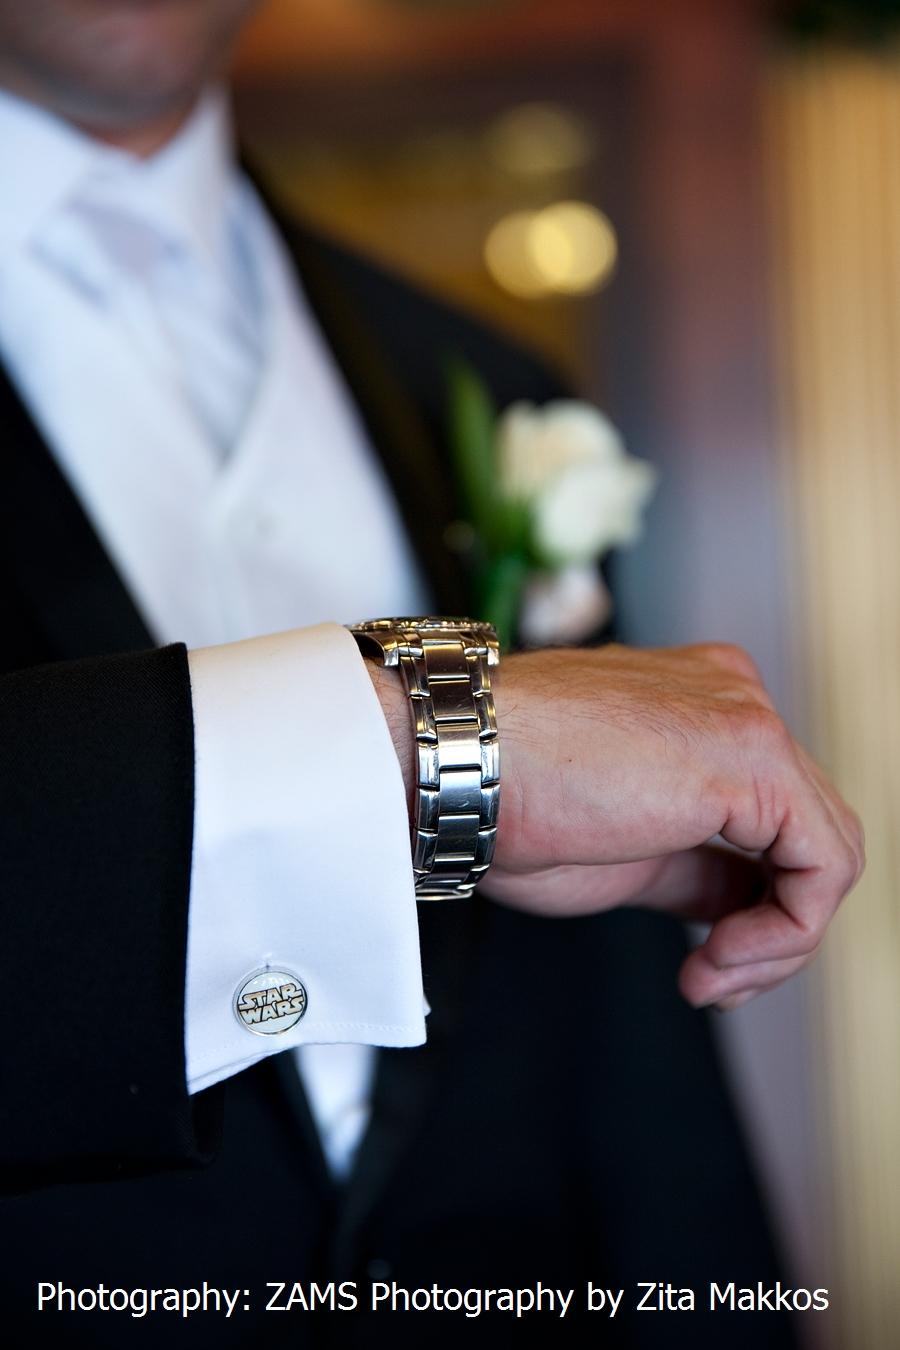 black_sabbath_1_cuff_links_men_wedding_groomsmen_gift_cufflinks_2.jpg